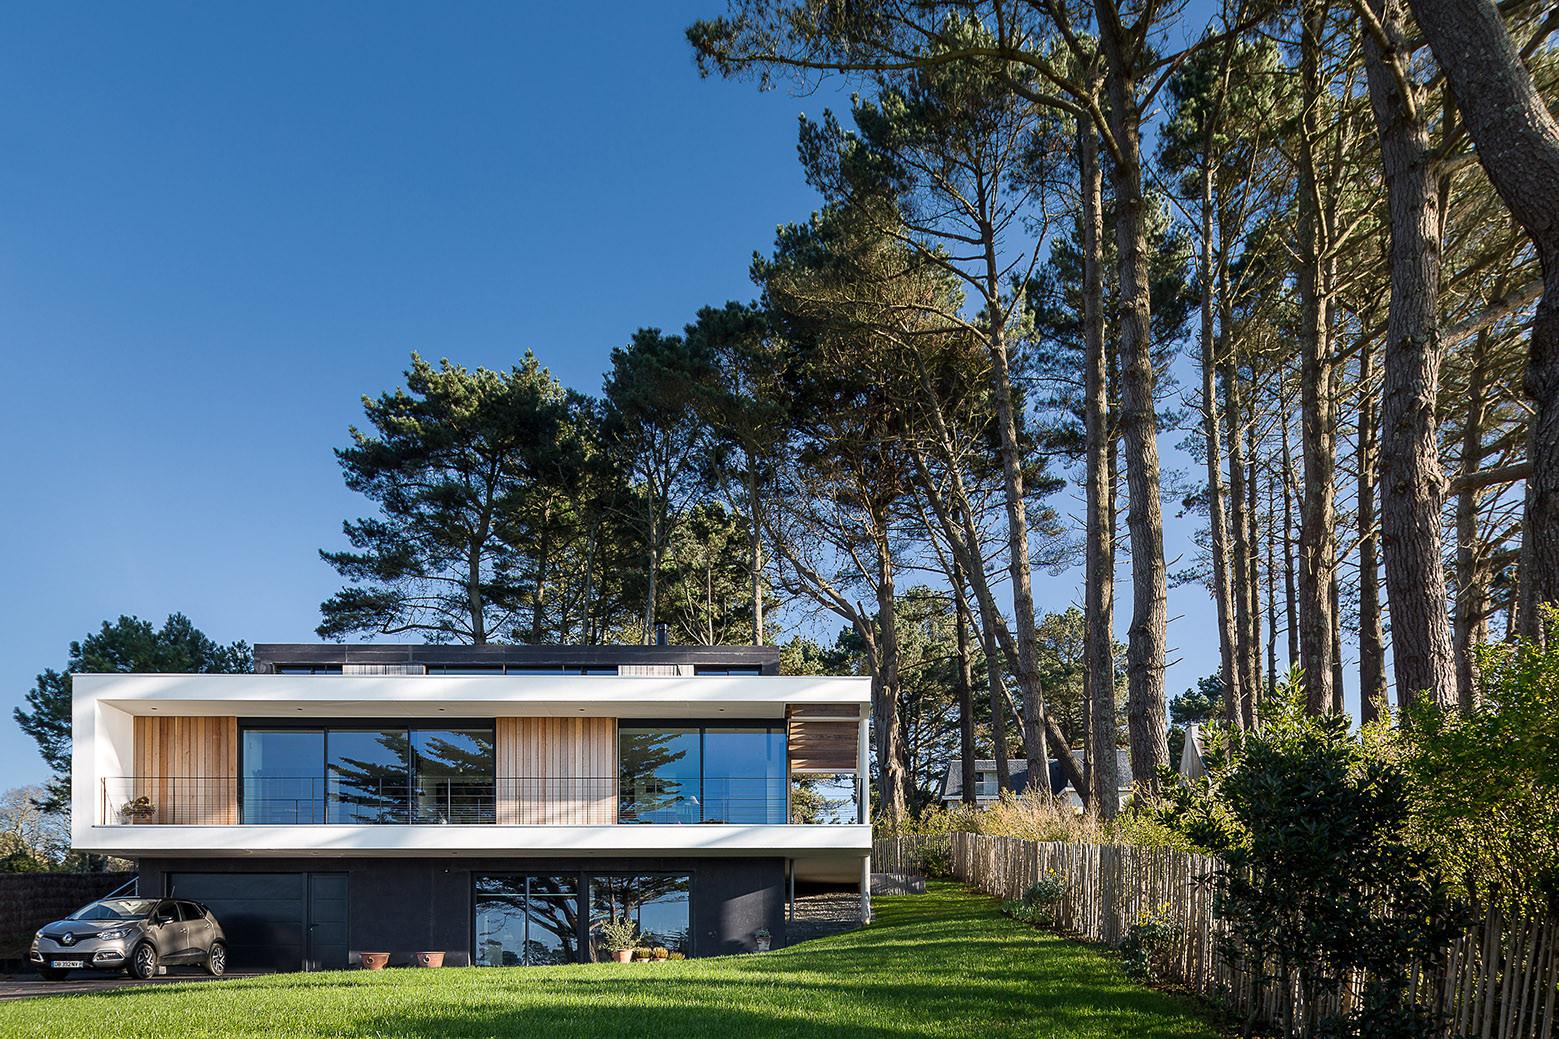 House in Crozon / Agence d'architecture Pierre-Yves Le Goaziou, © Pascal Léopold